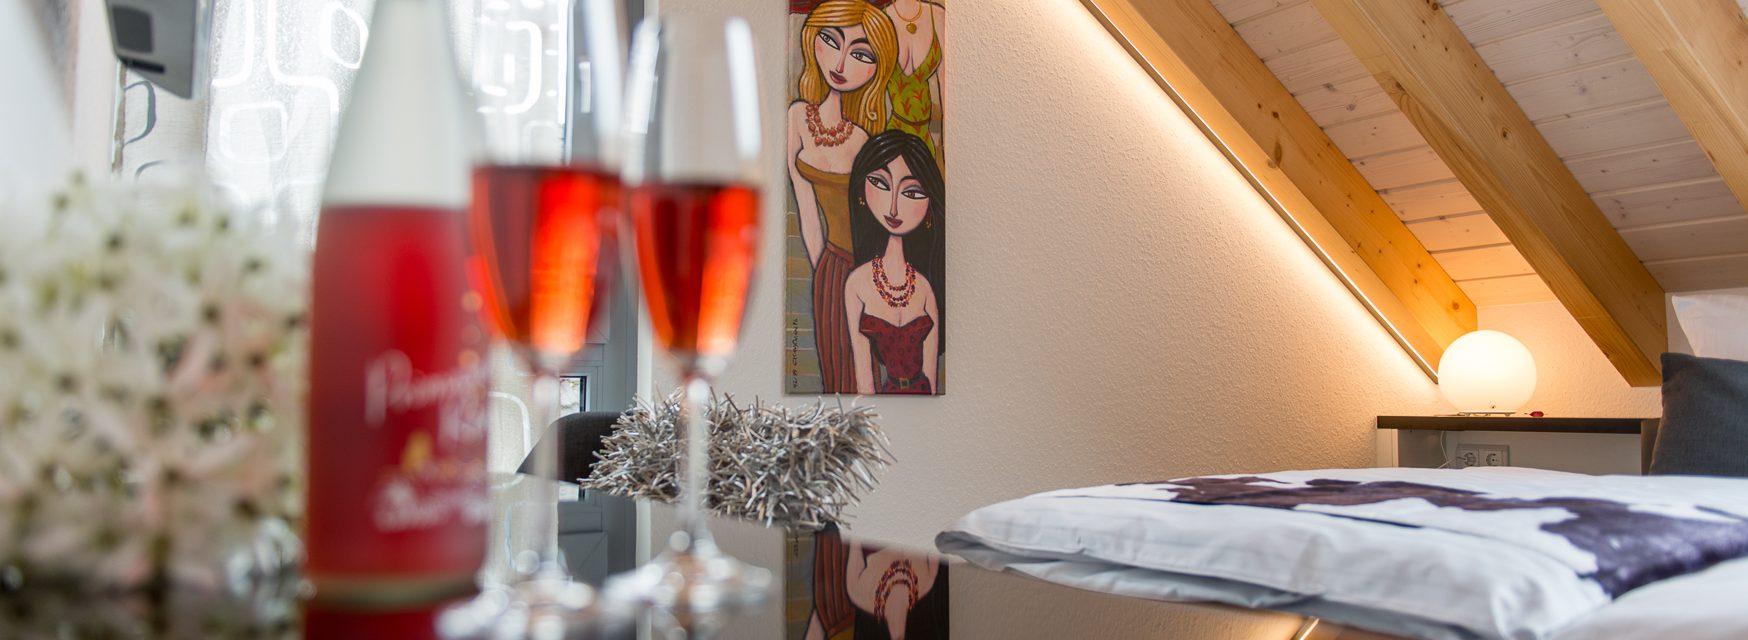 Ferienwohnungen Bensheim | Apartmenthaus Bergstraße | Fam. Horster